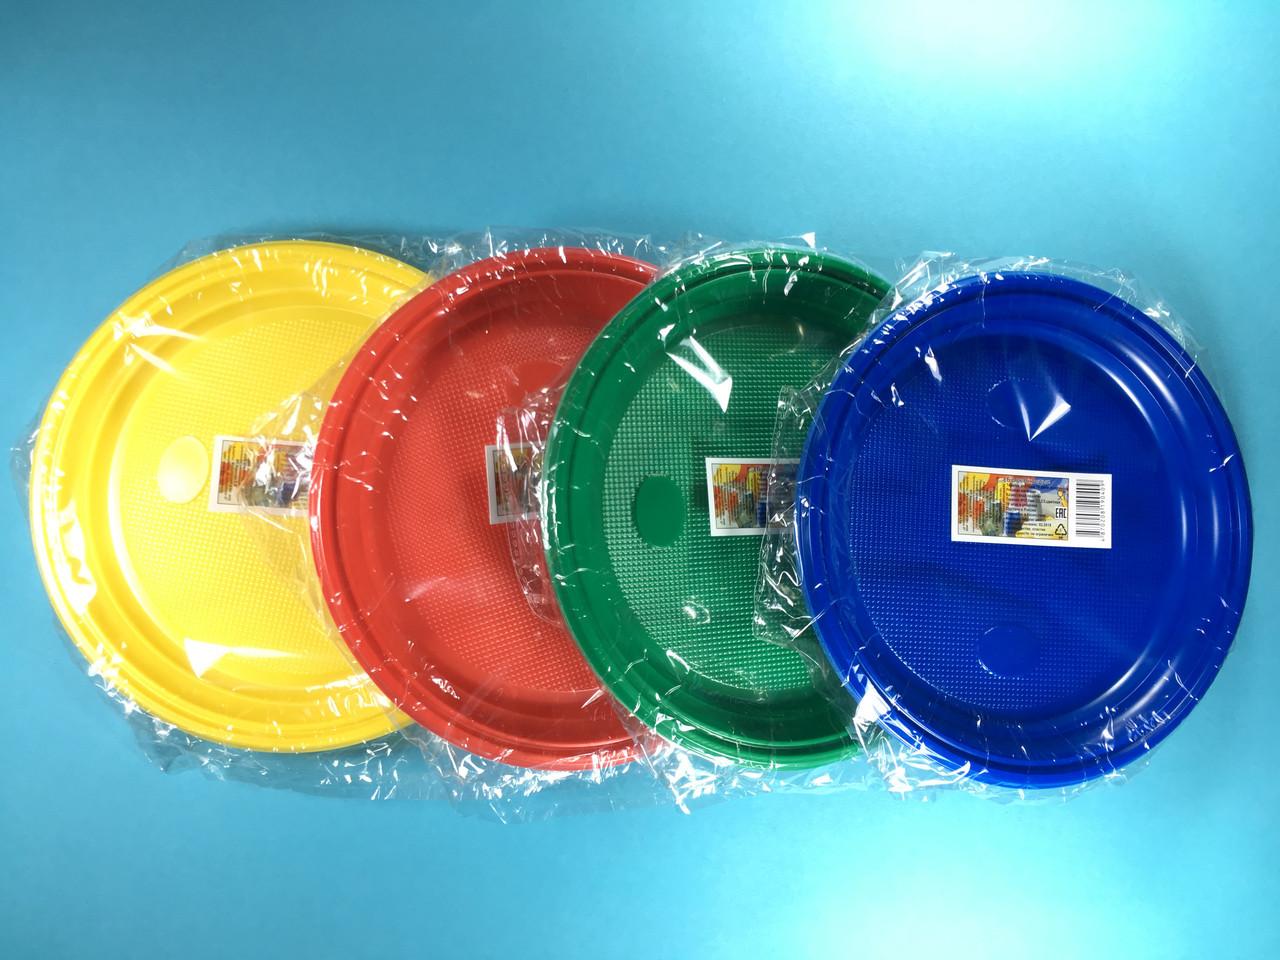 Тарелка одноразовая цветная 210 мм 10 шт/уп Sherdin